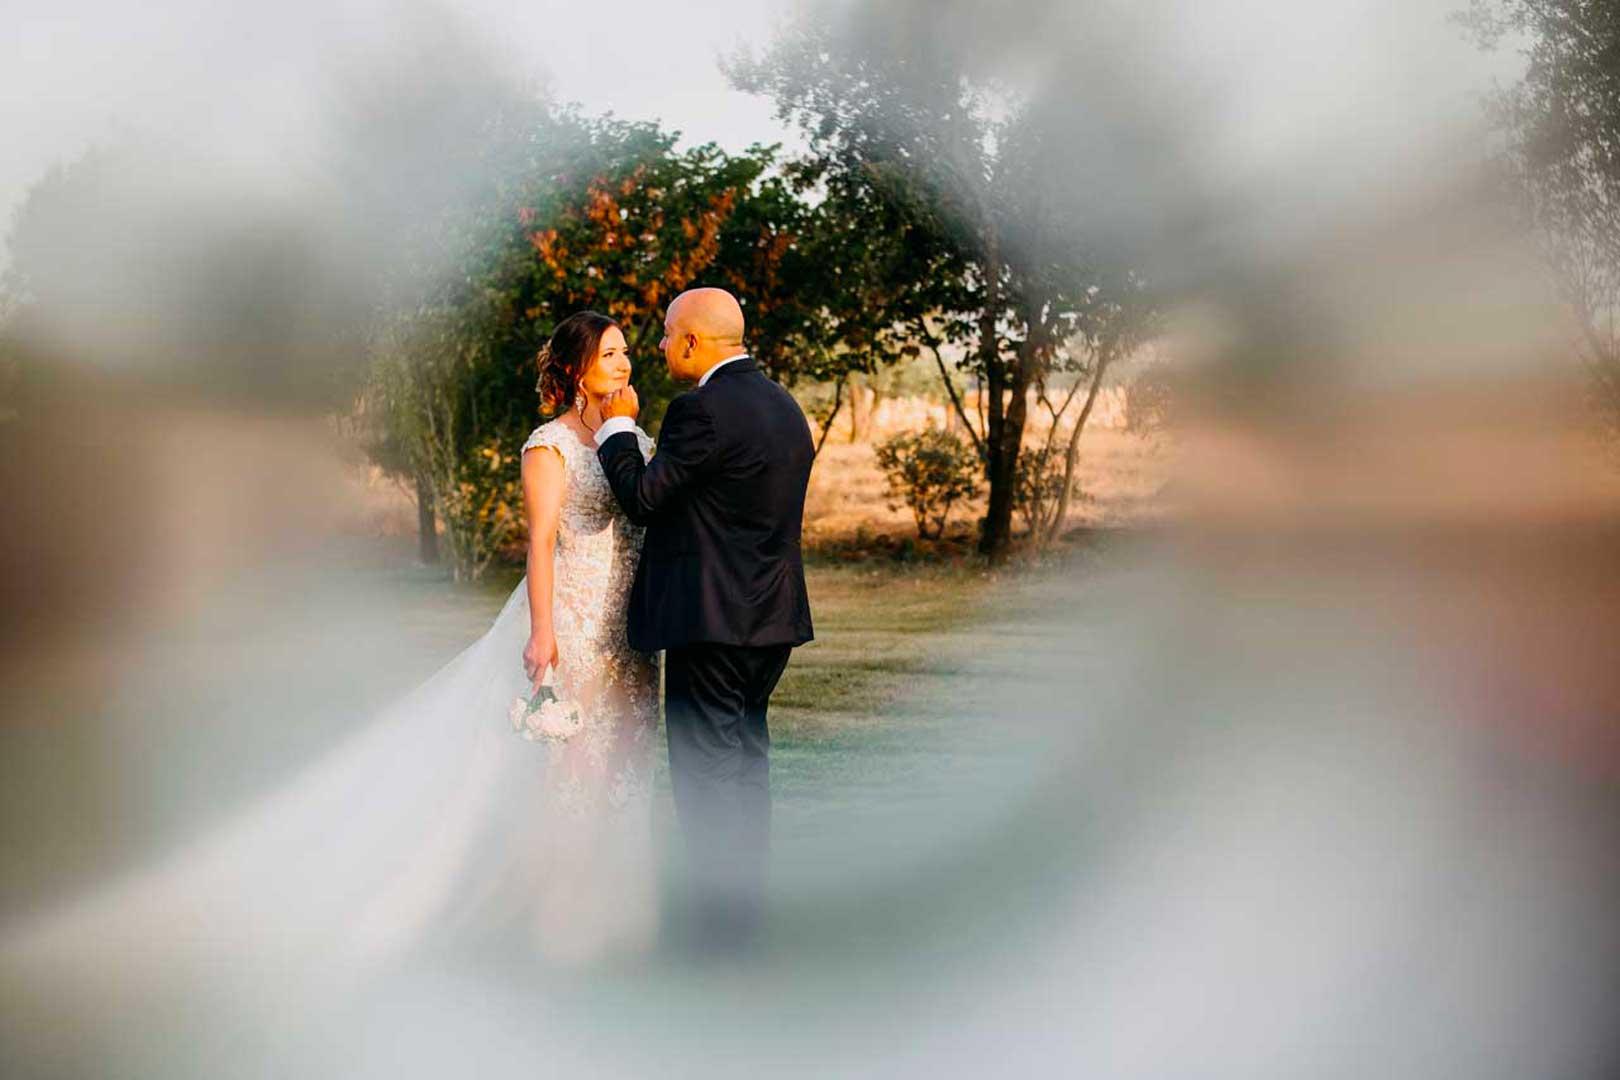 042-wedding-day-gianni-lepore-photographer